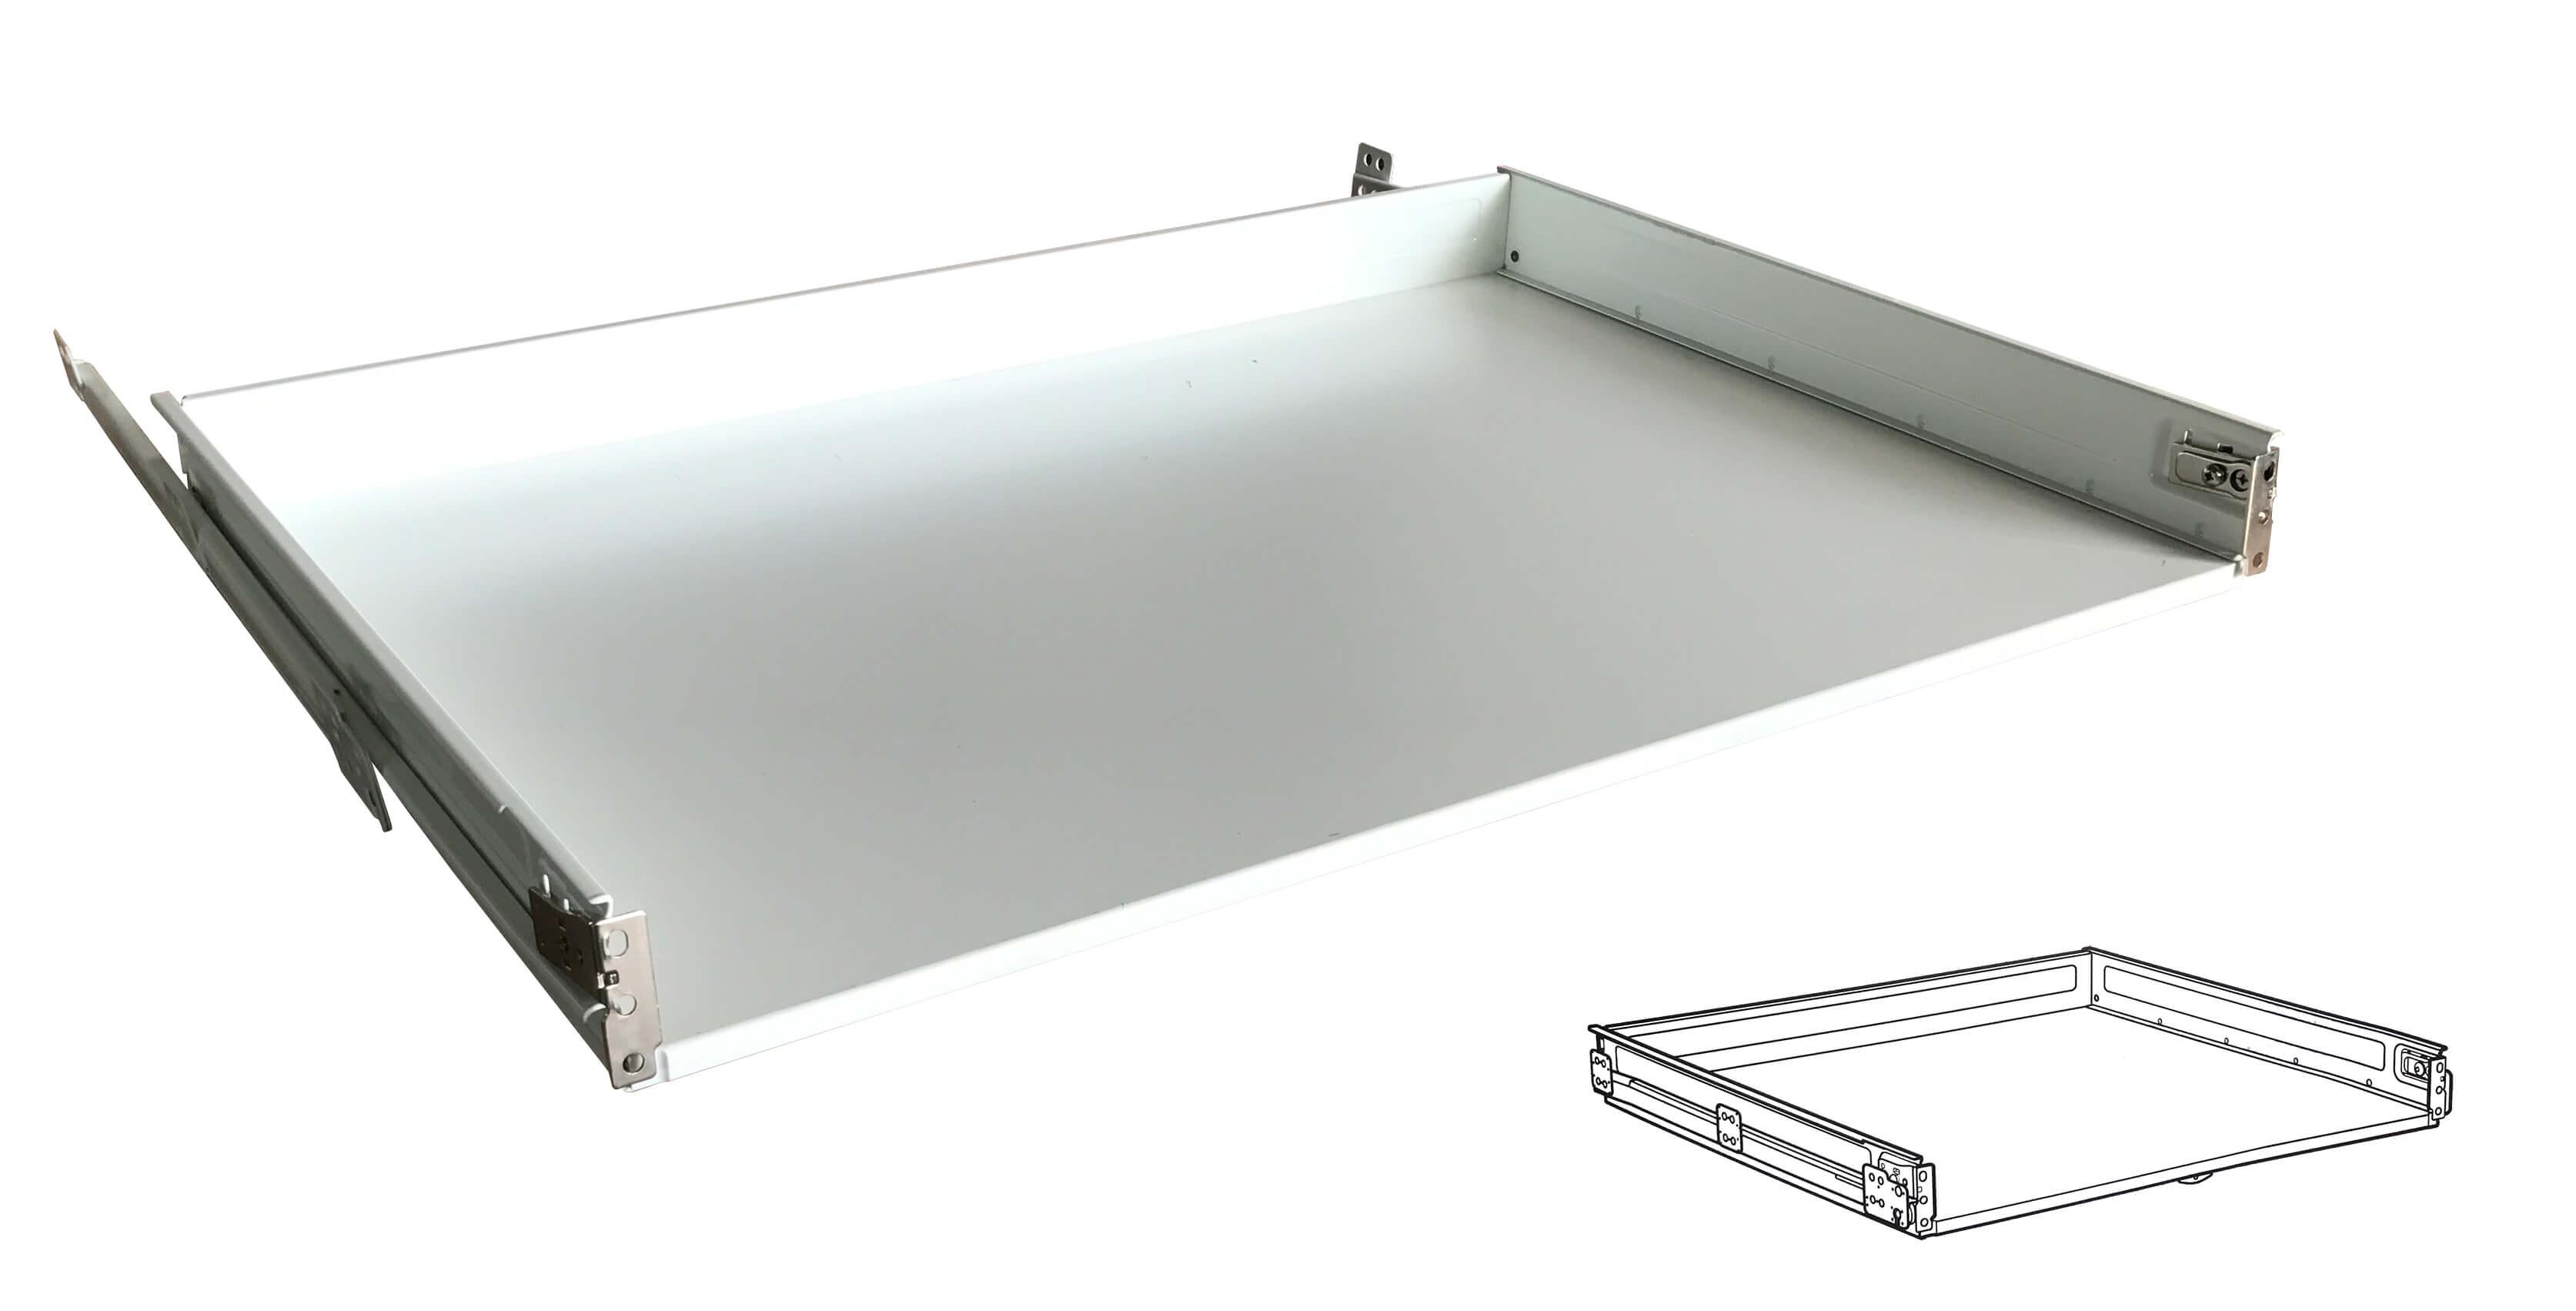 Ikea kuche metod schublade for Ikea schubladen kuche